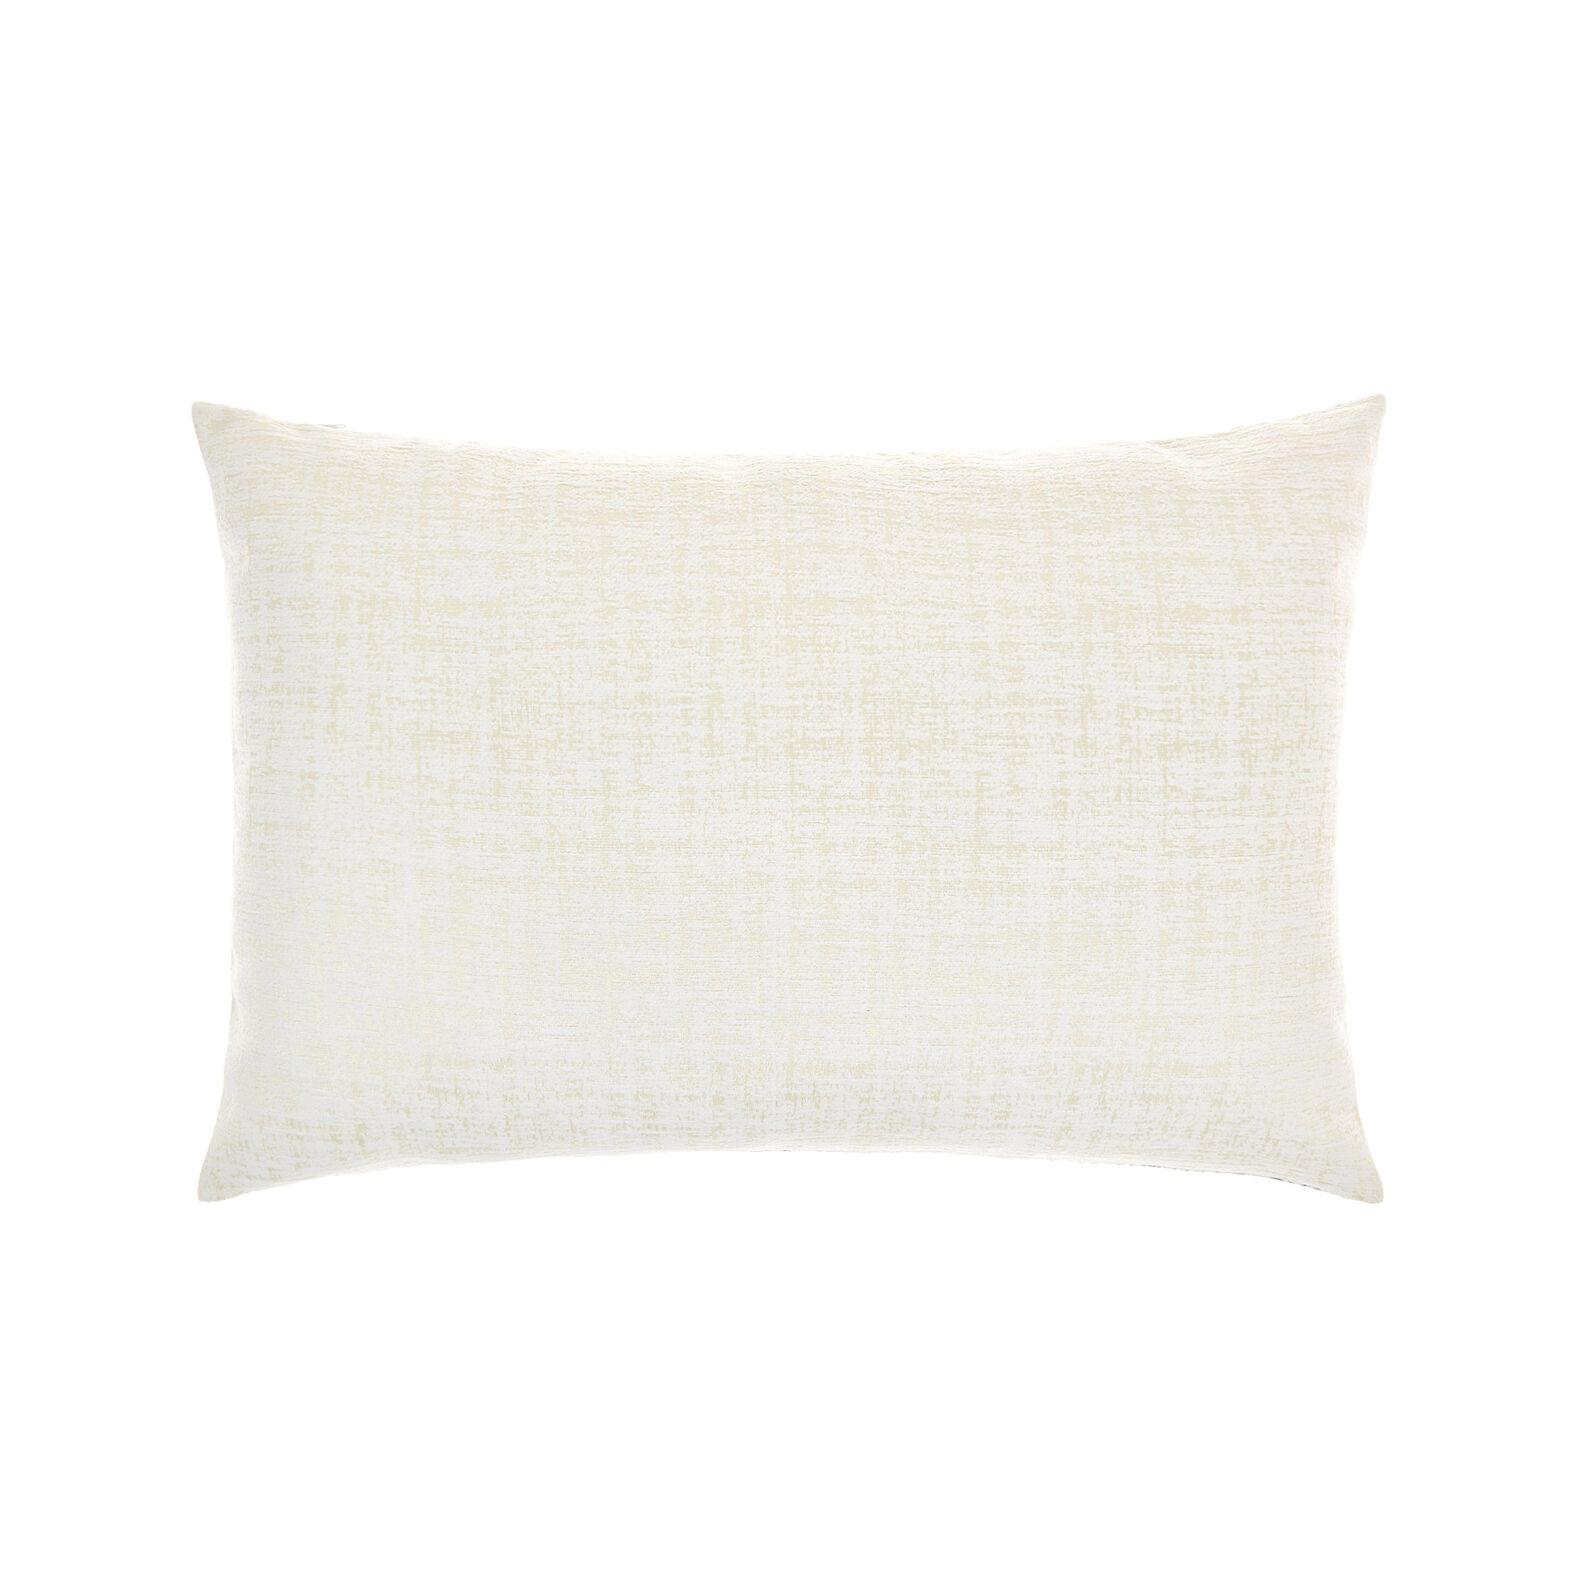 Rectangular cushion with paisley print